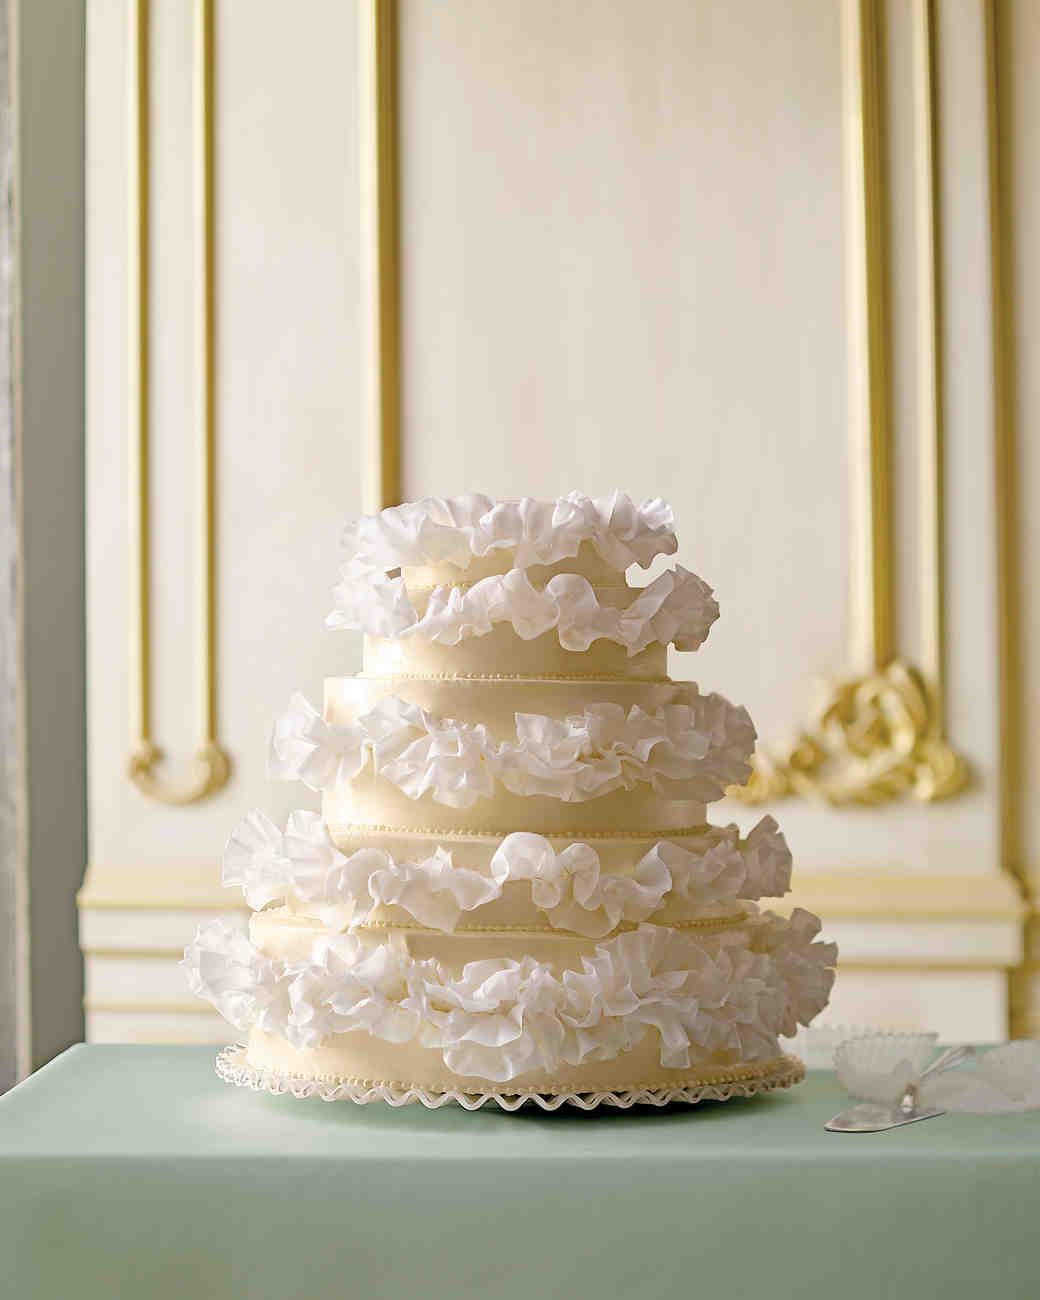 cake-1-0811mwd107413.jpg